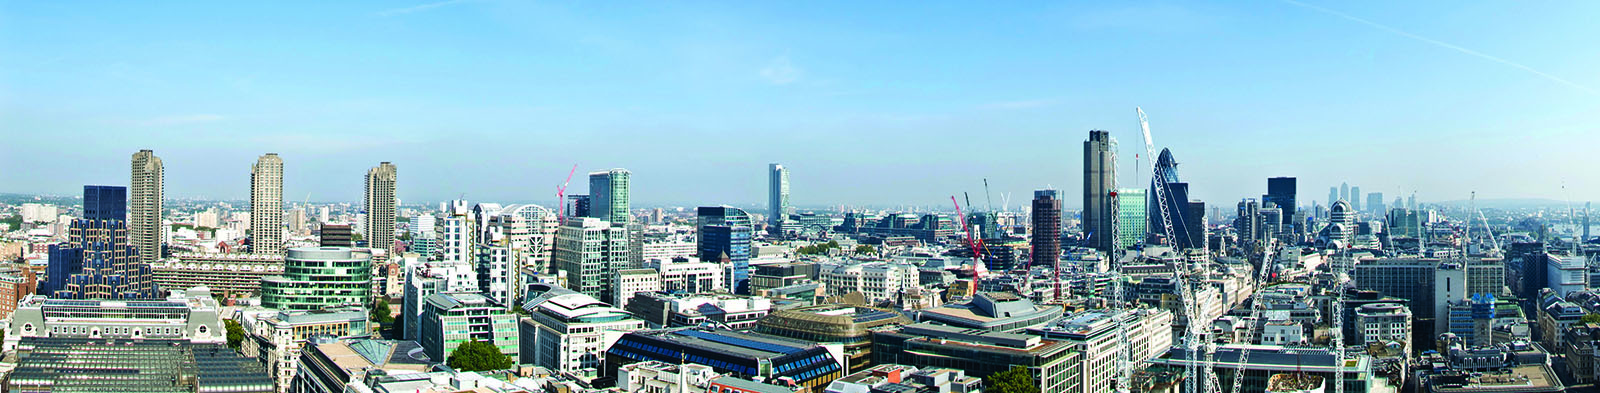 London skyline with blue sky.